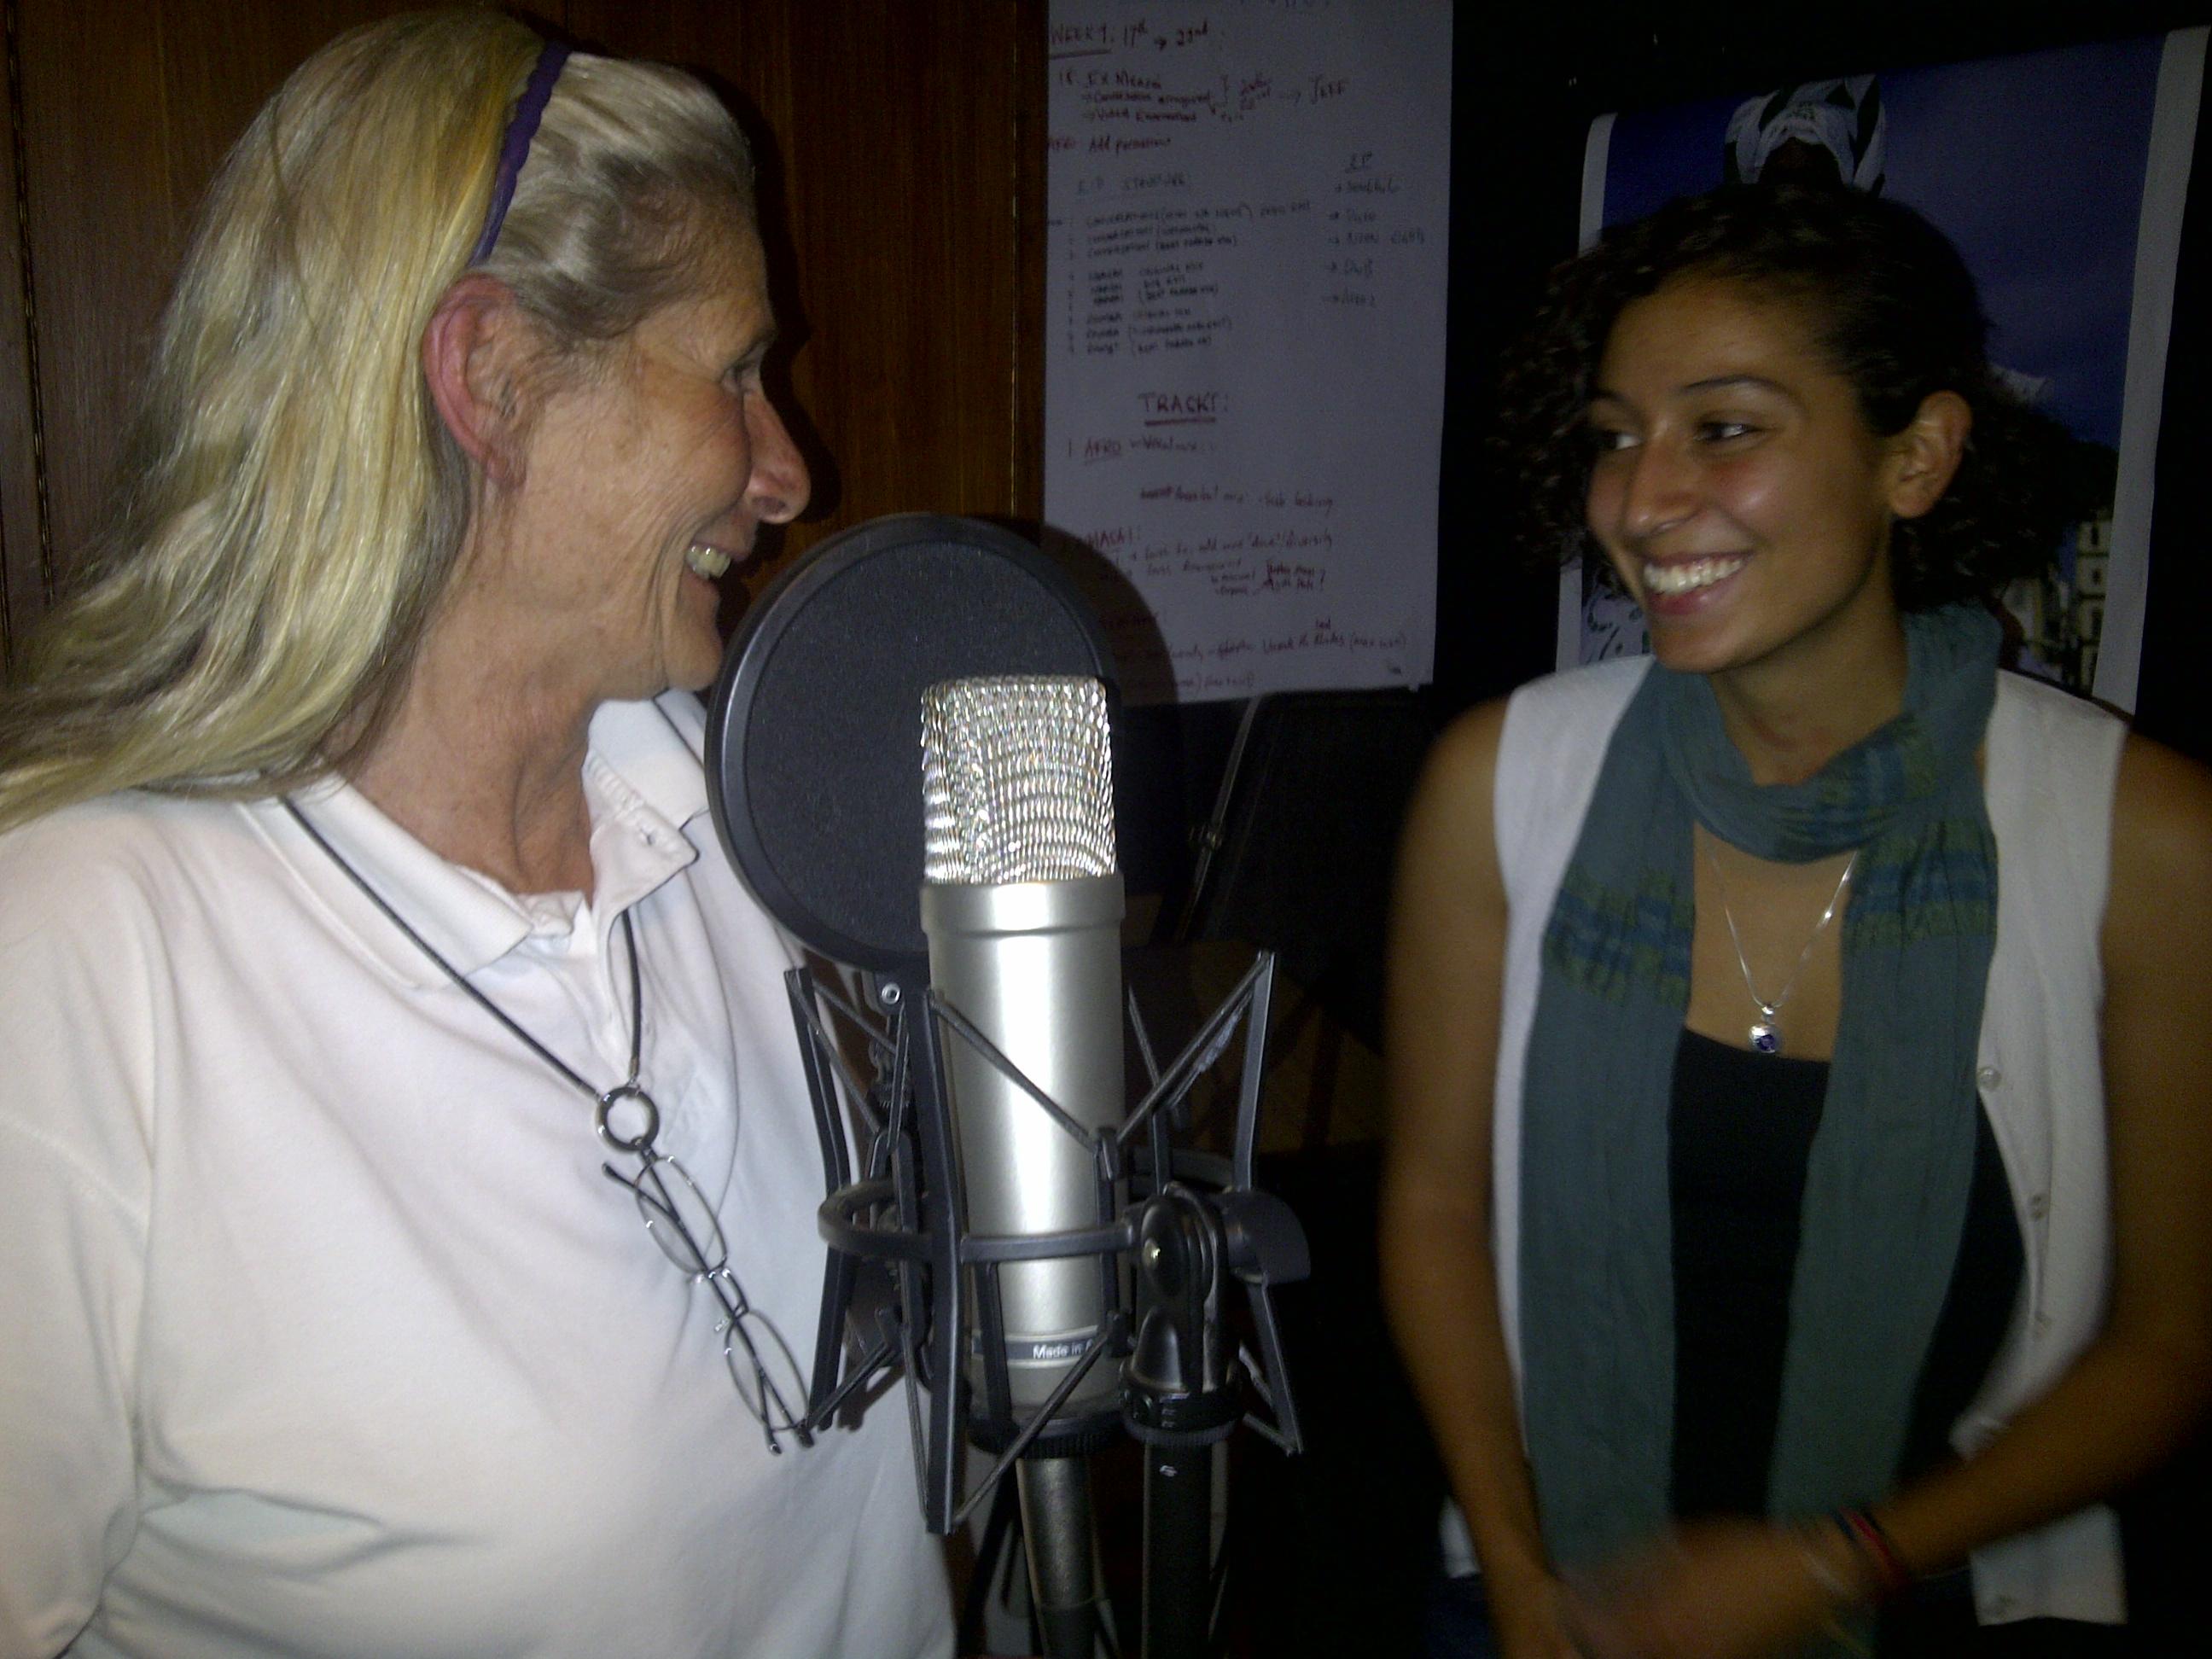 Caption: Annie Olivecrona in recording studio with Elleni Stephanou, Credit: Paula Kahumbu